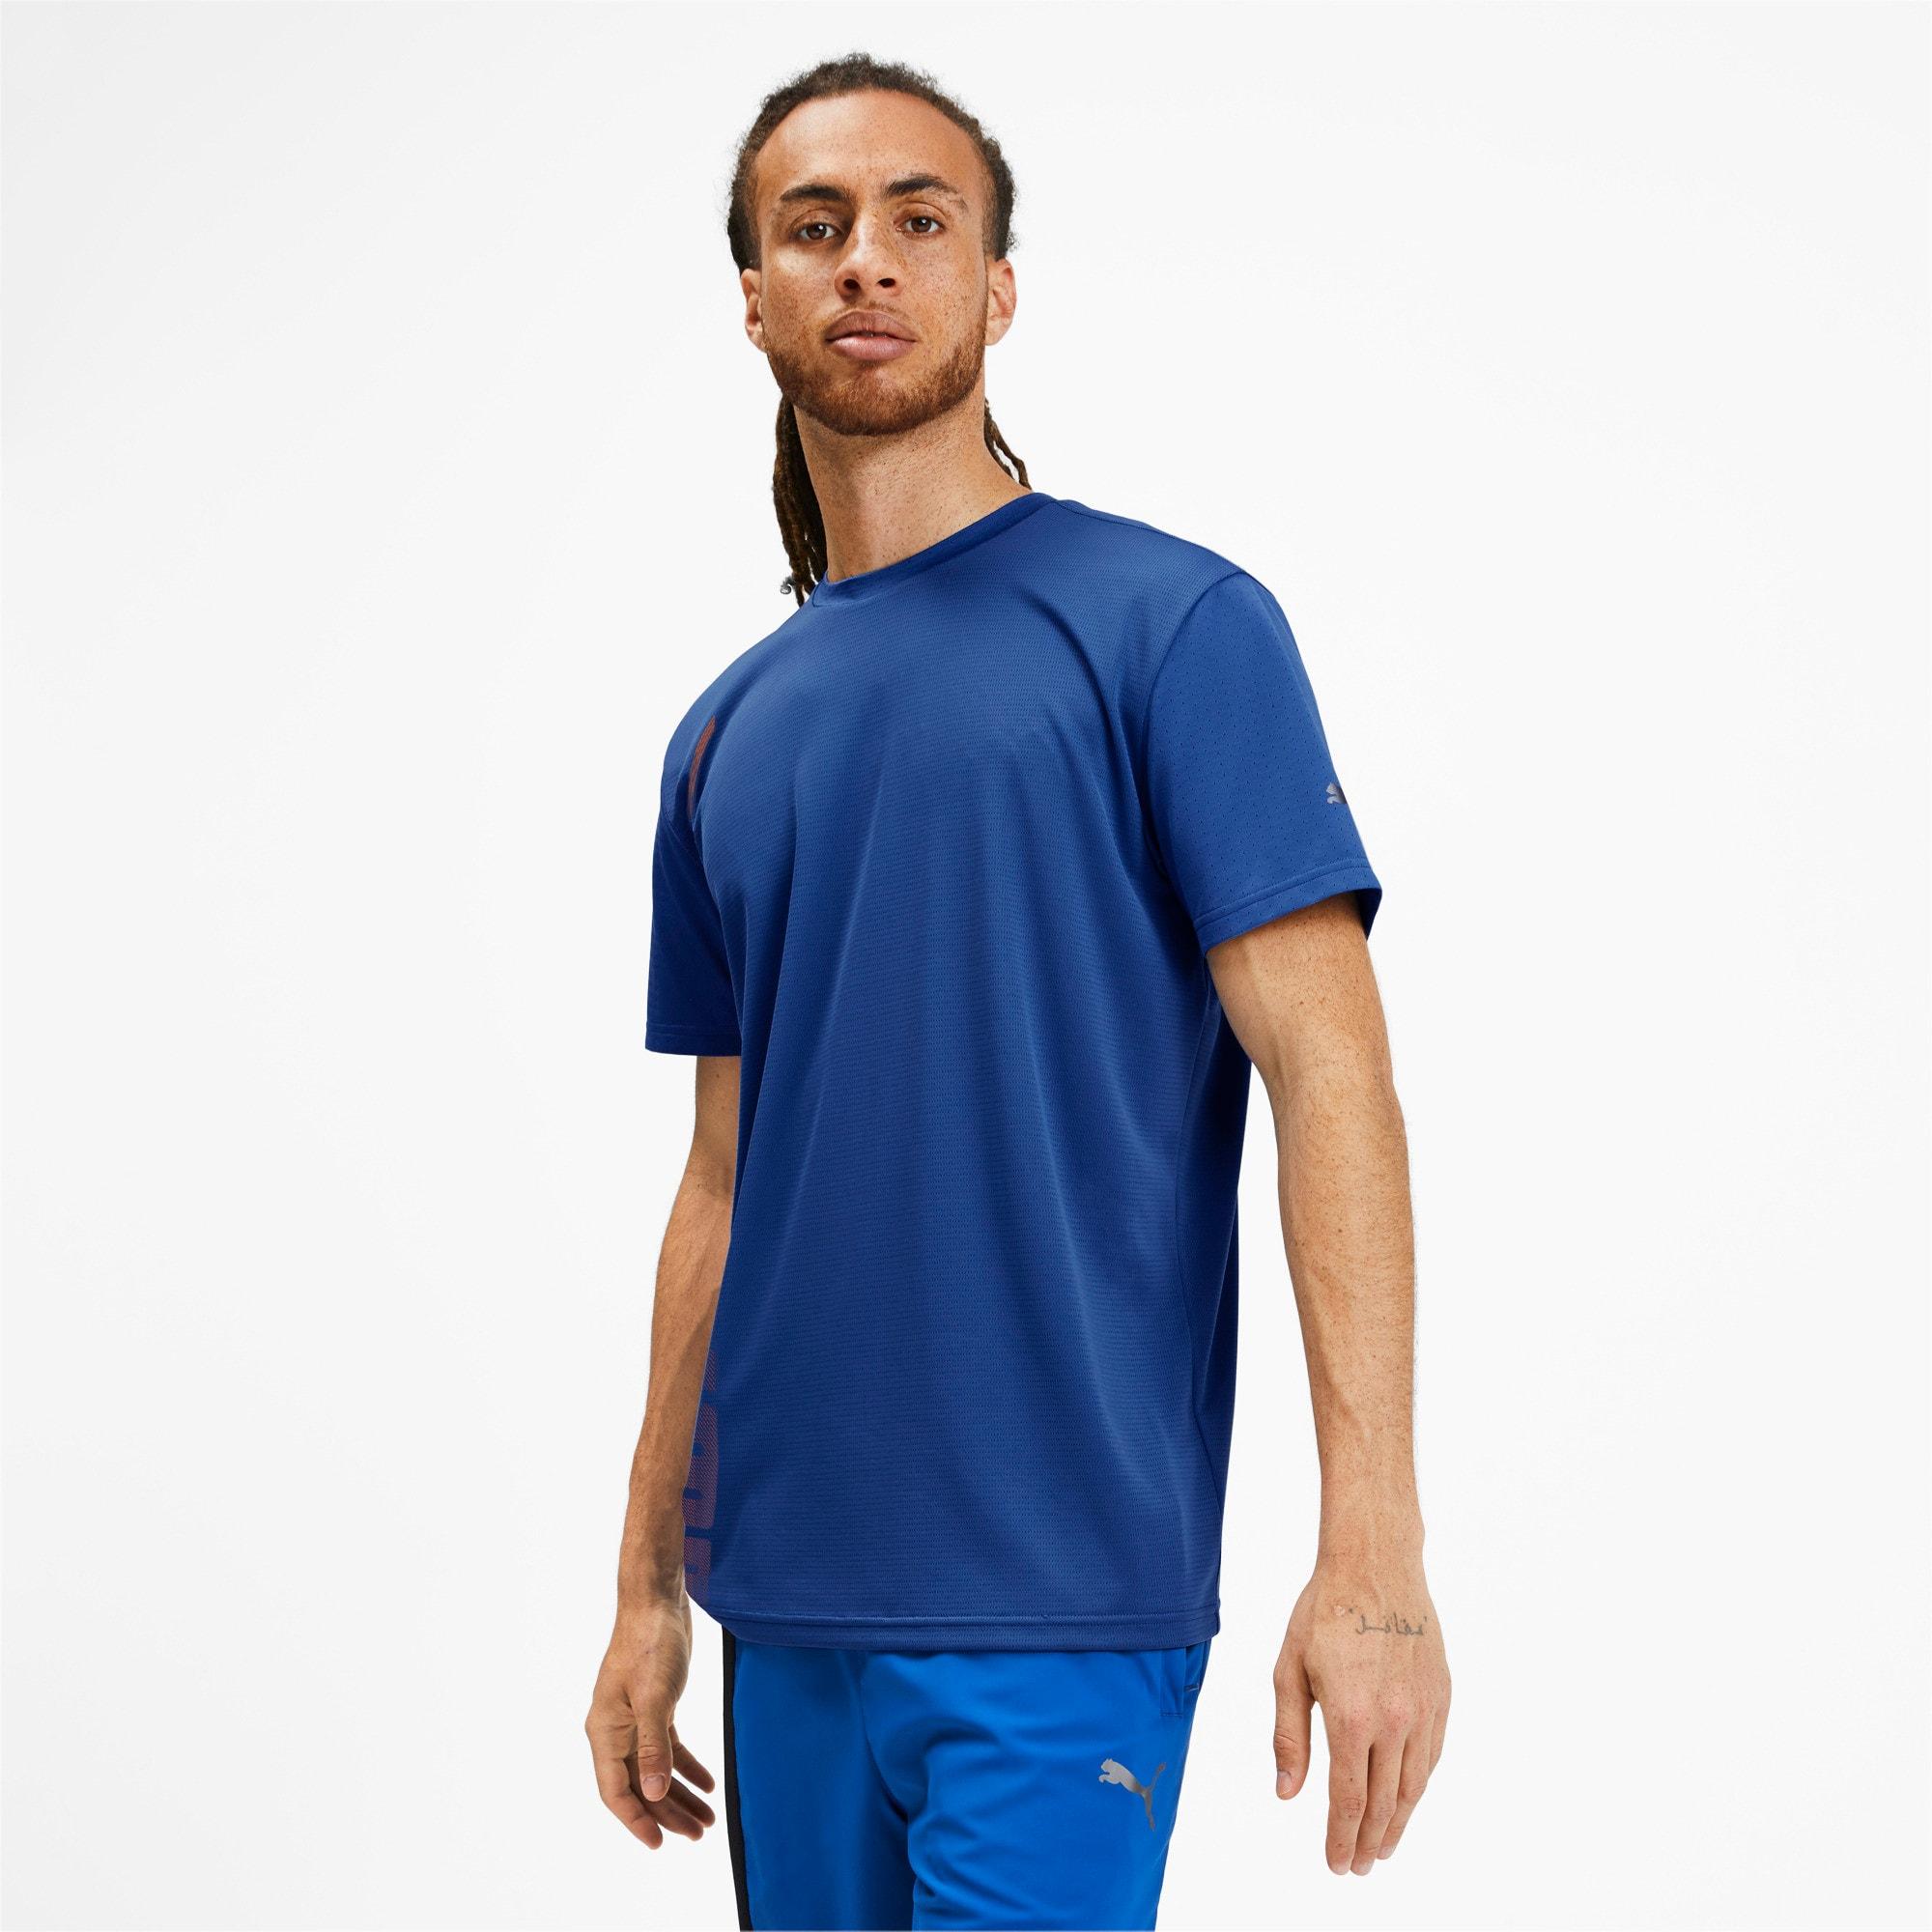 Thumbnail 1 of Collective Herren T-Shirt, Galaxy Blue, medium